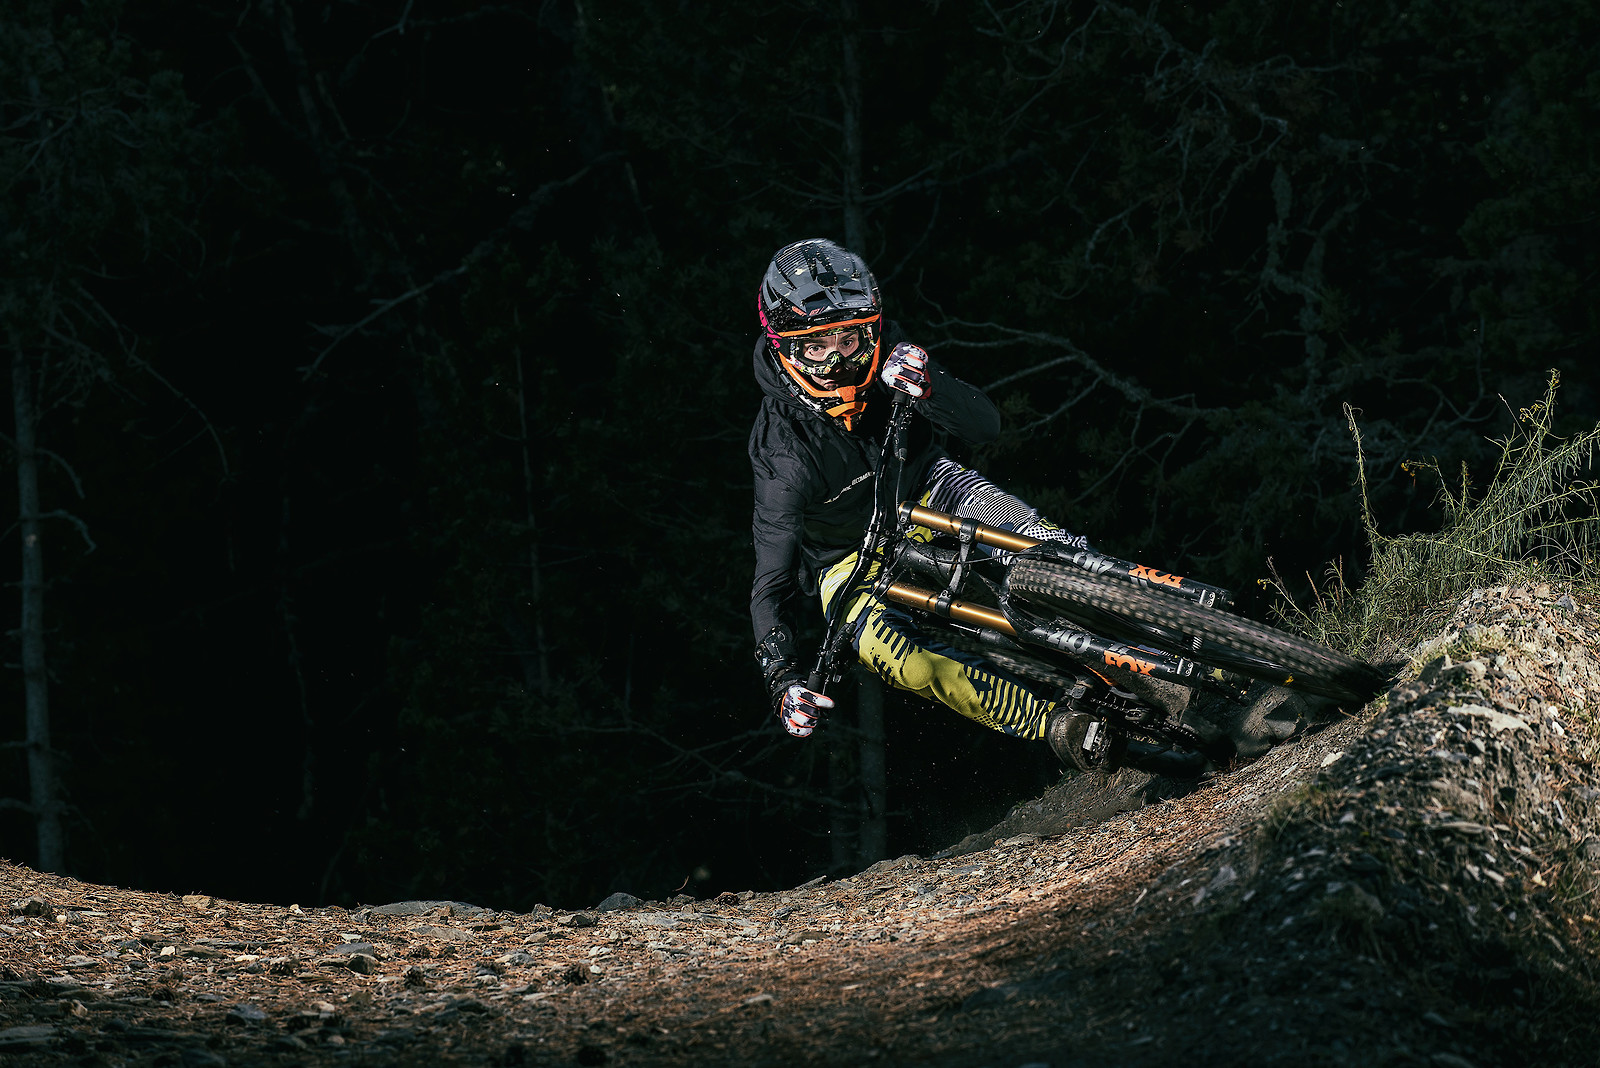 Mamenus - NicoBrizin - Mountain Biking Pictures - Vital MTB